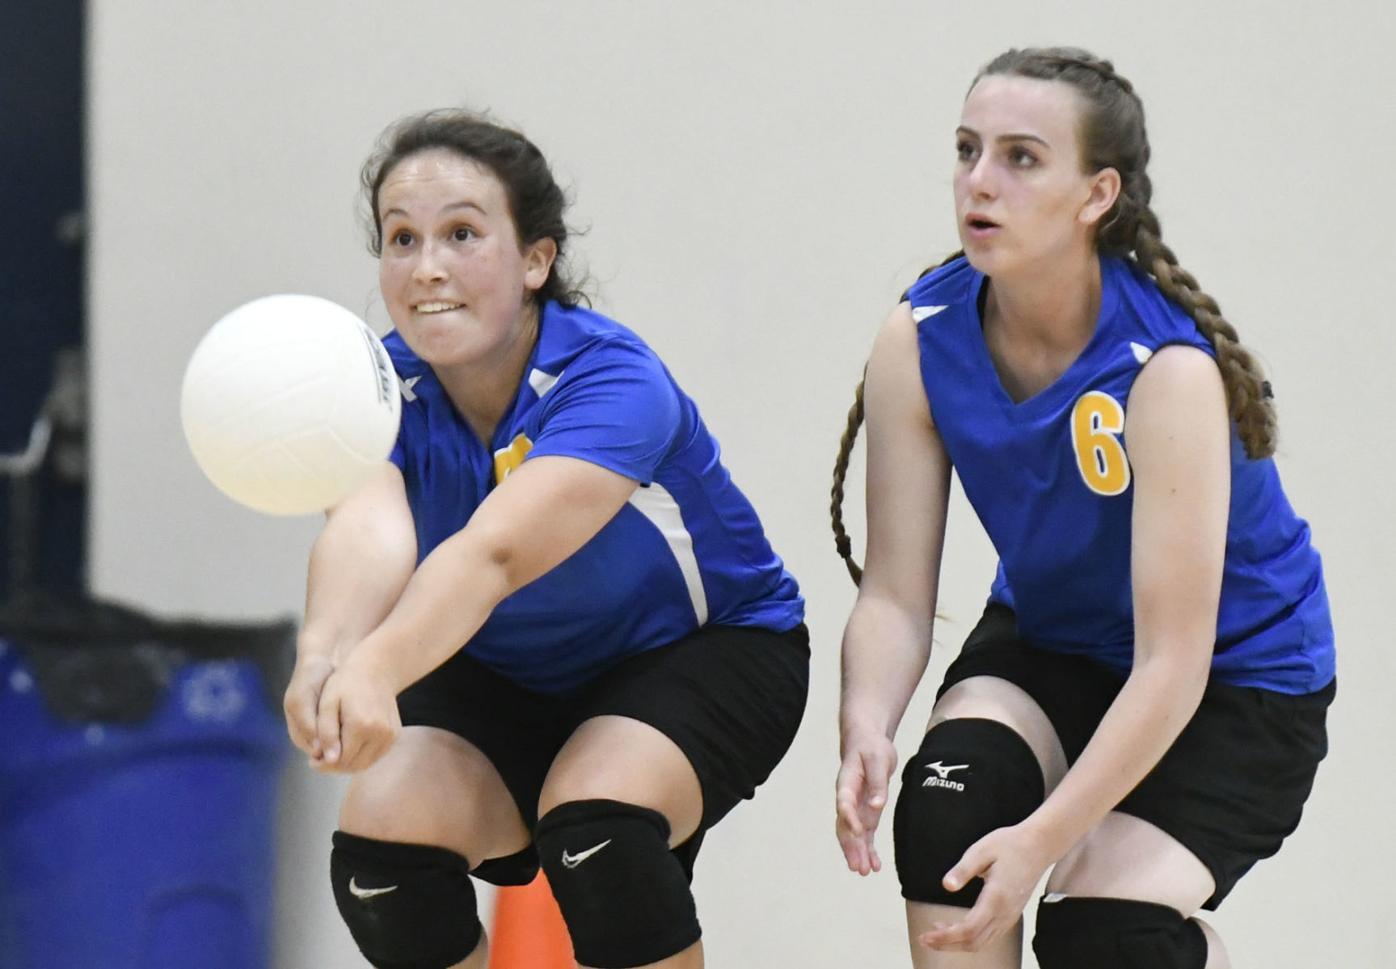 091219 Shandon VCA volleyball 01.jpg